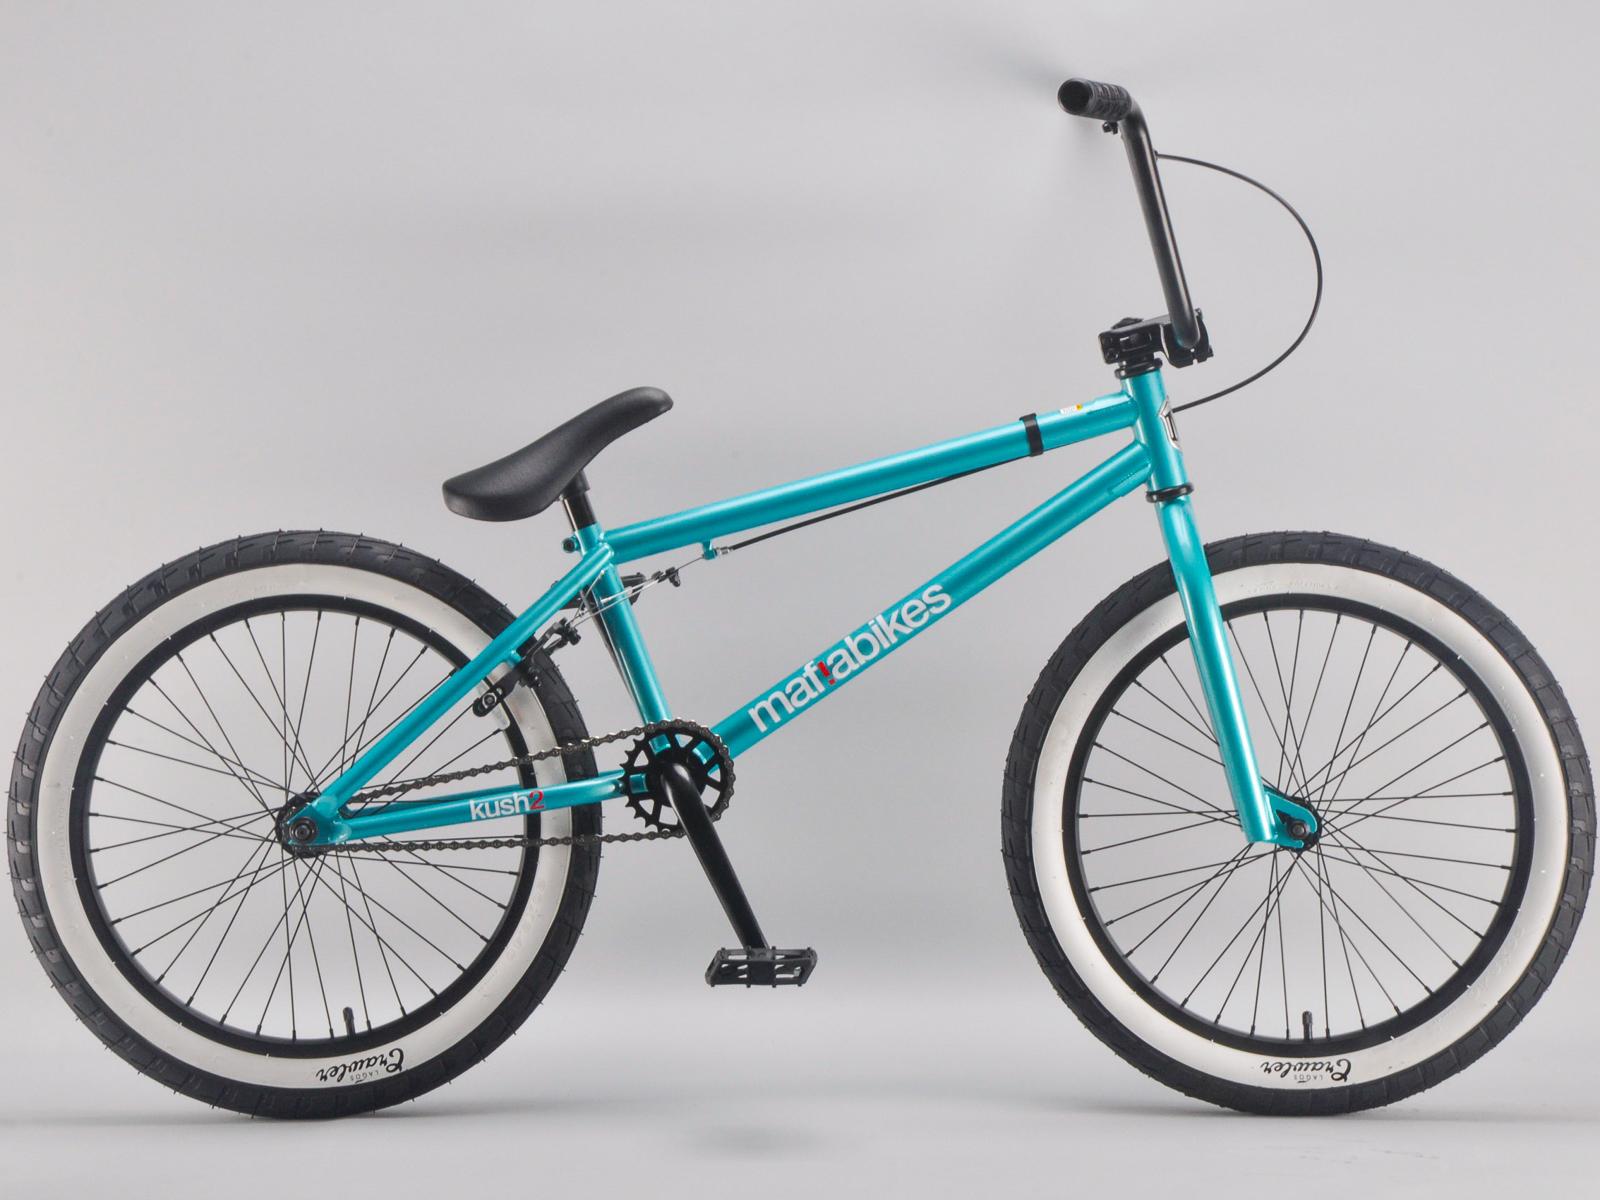 Mafiabikes KUSH 2 20 inch BMX bike multiple colours 20\